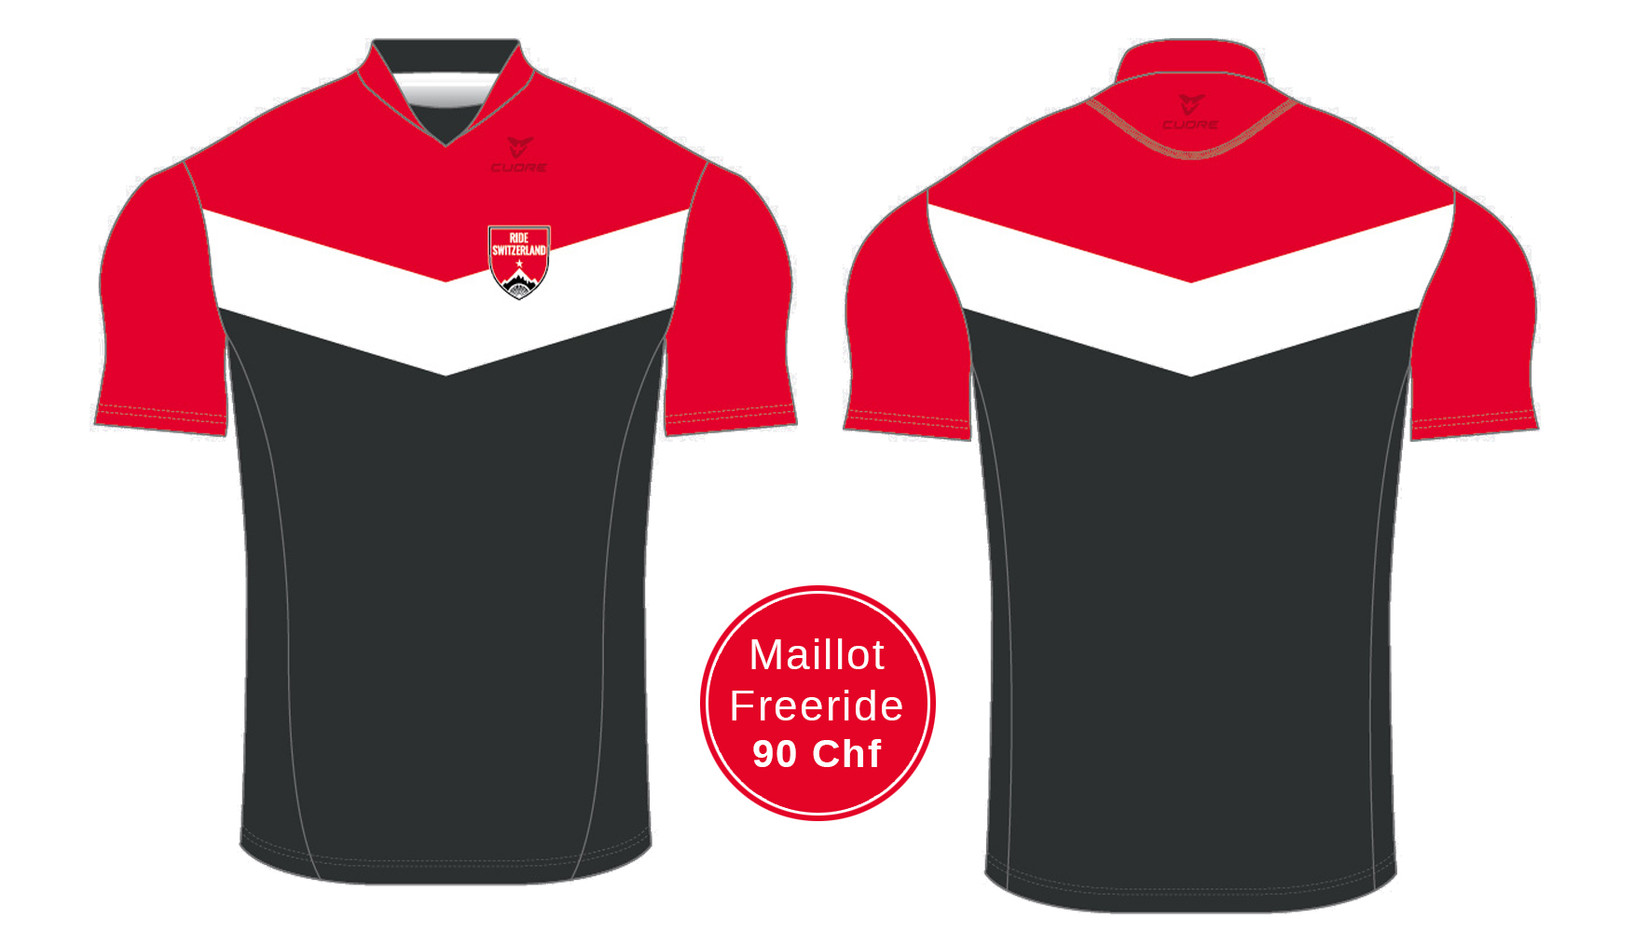 Maillot_Freeride_Rideswitzerland_19.jpg